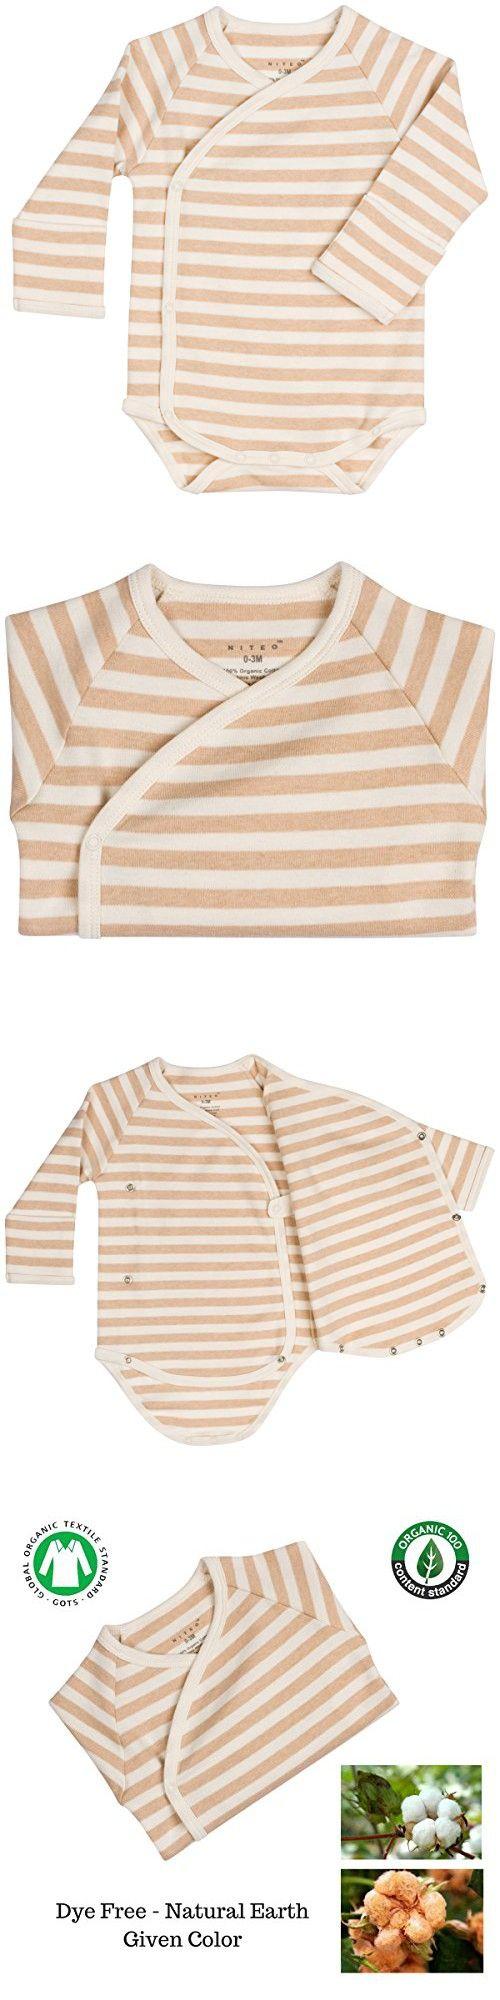 Niteo Baby Organic Cotton Kimono Onesie Bodysuit Long Sleeve with Side Snaps, Light Brown Stripes, 0-3M